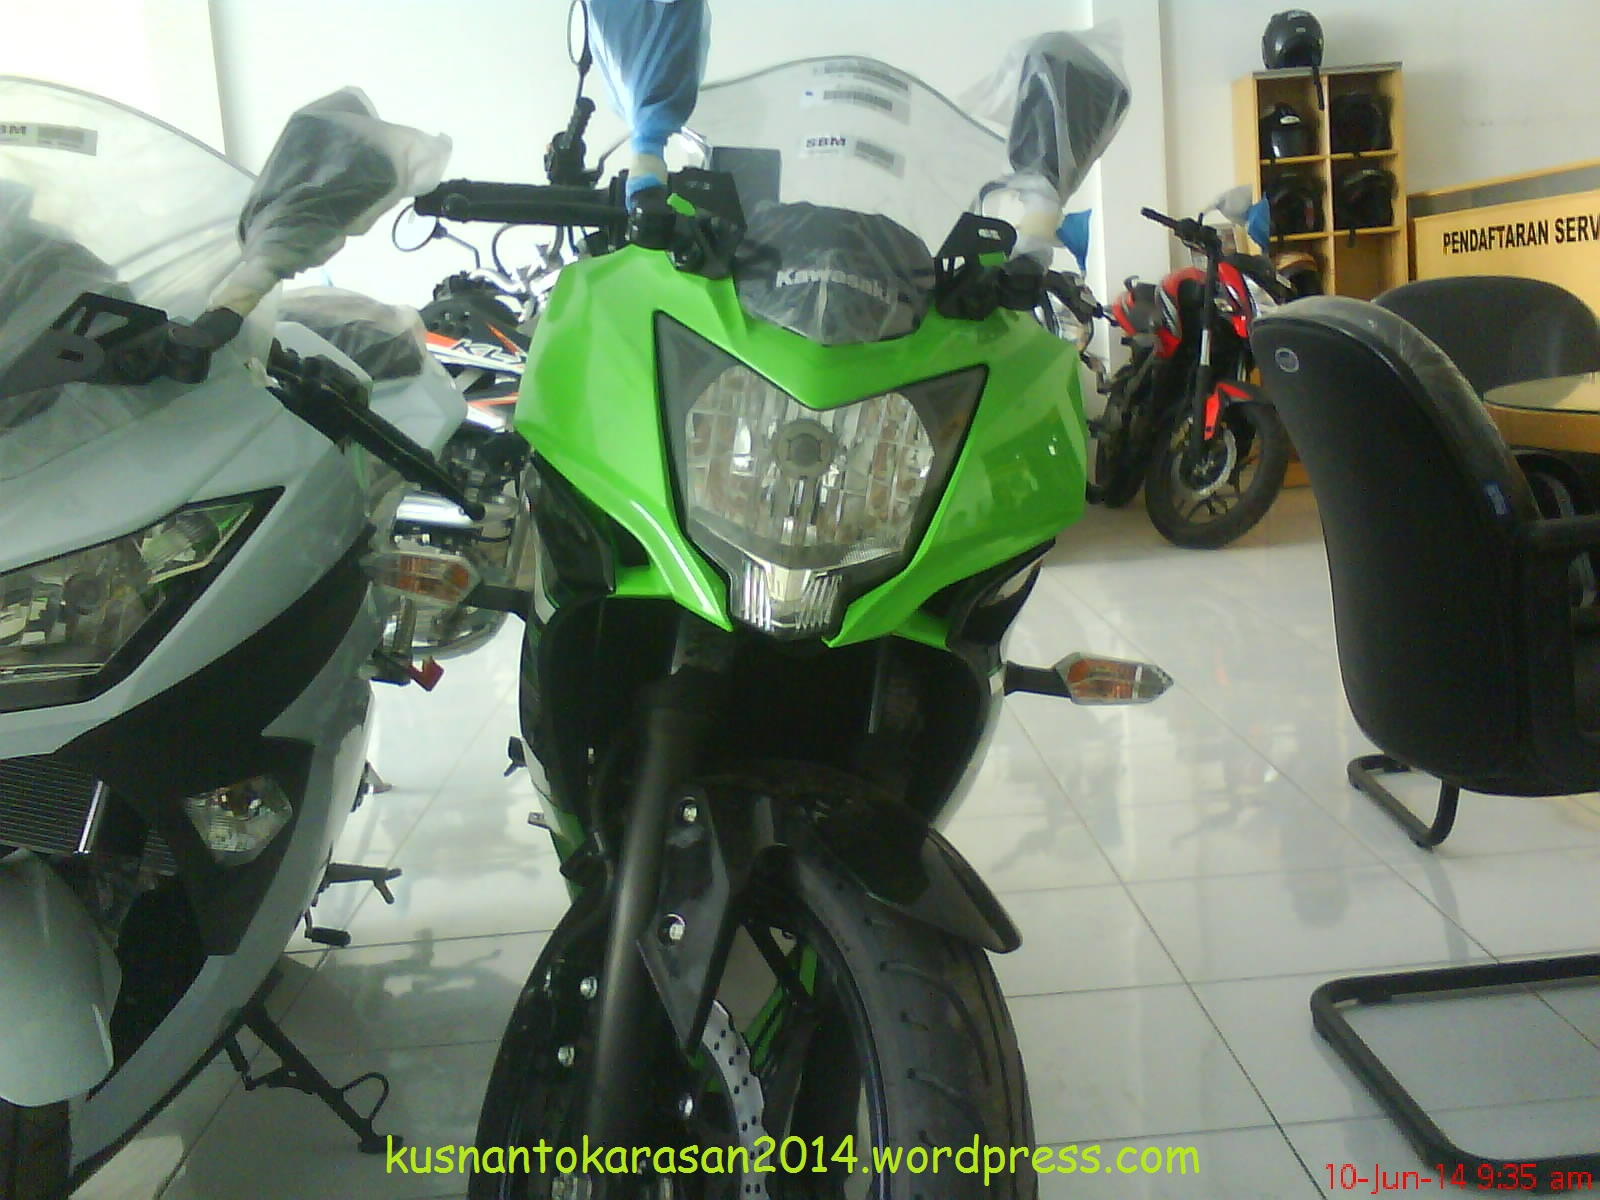 Harga Ninja 250 Rr Mono Di Bantul Yogyakarta Kusnantokarasancom